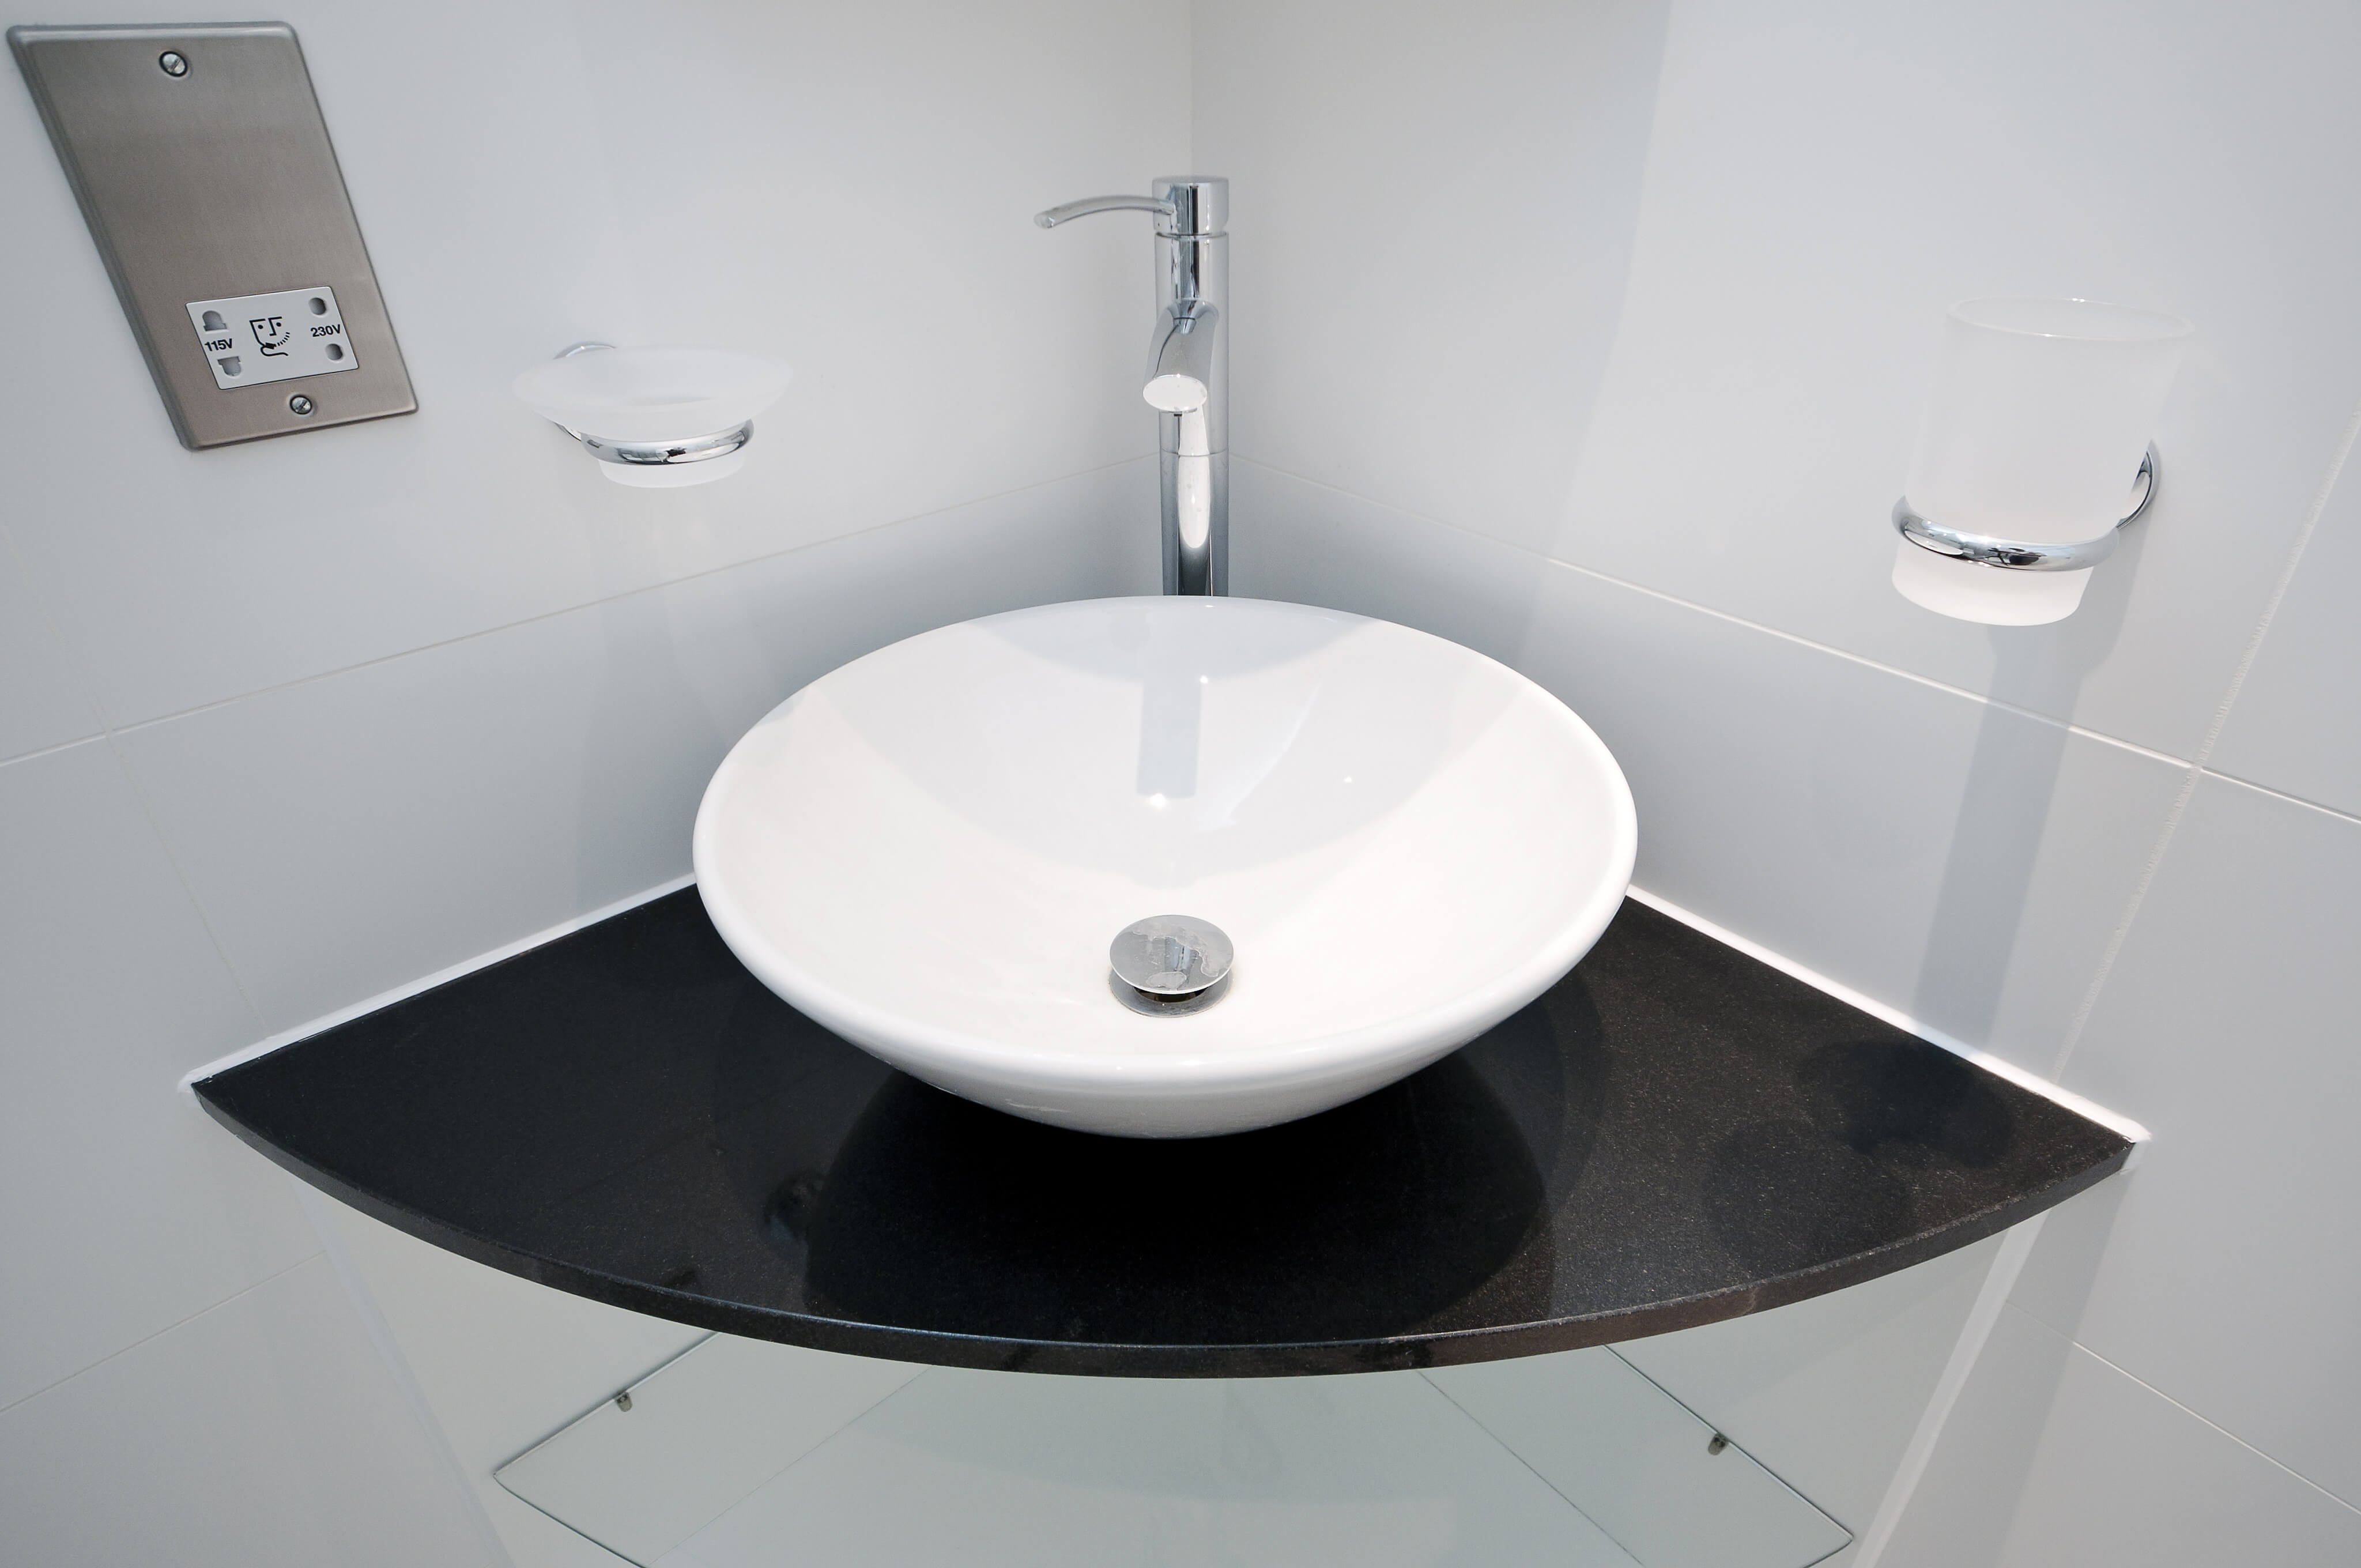 Bathroom corner glass shelf - Shutterstock_96410495